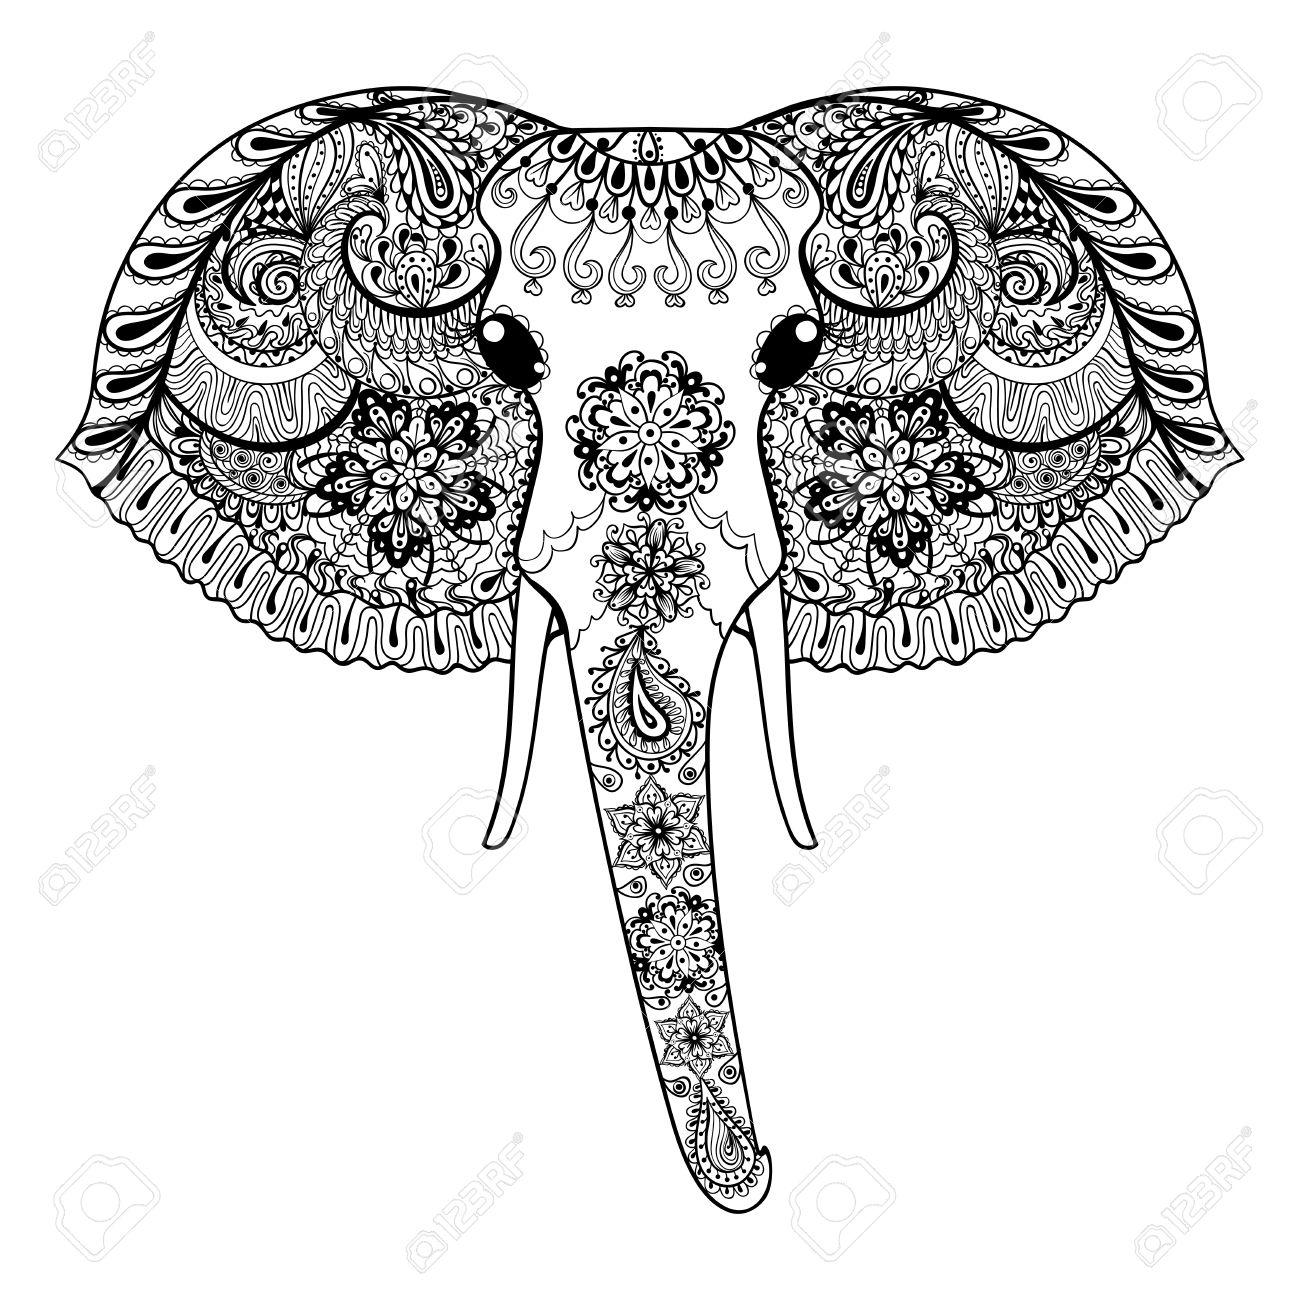 1300x1300 Zentangle Stylized Indian Elephant. Hand Drawn Paisley Vector